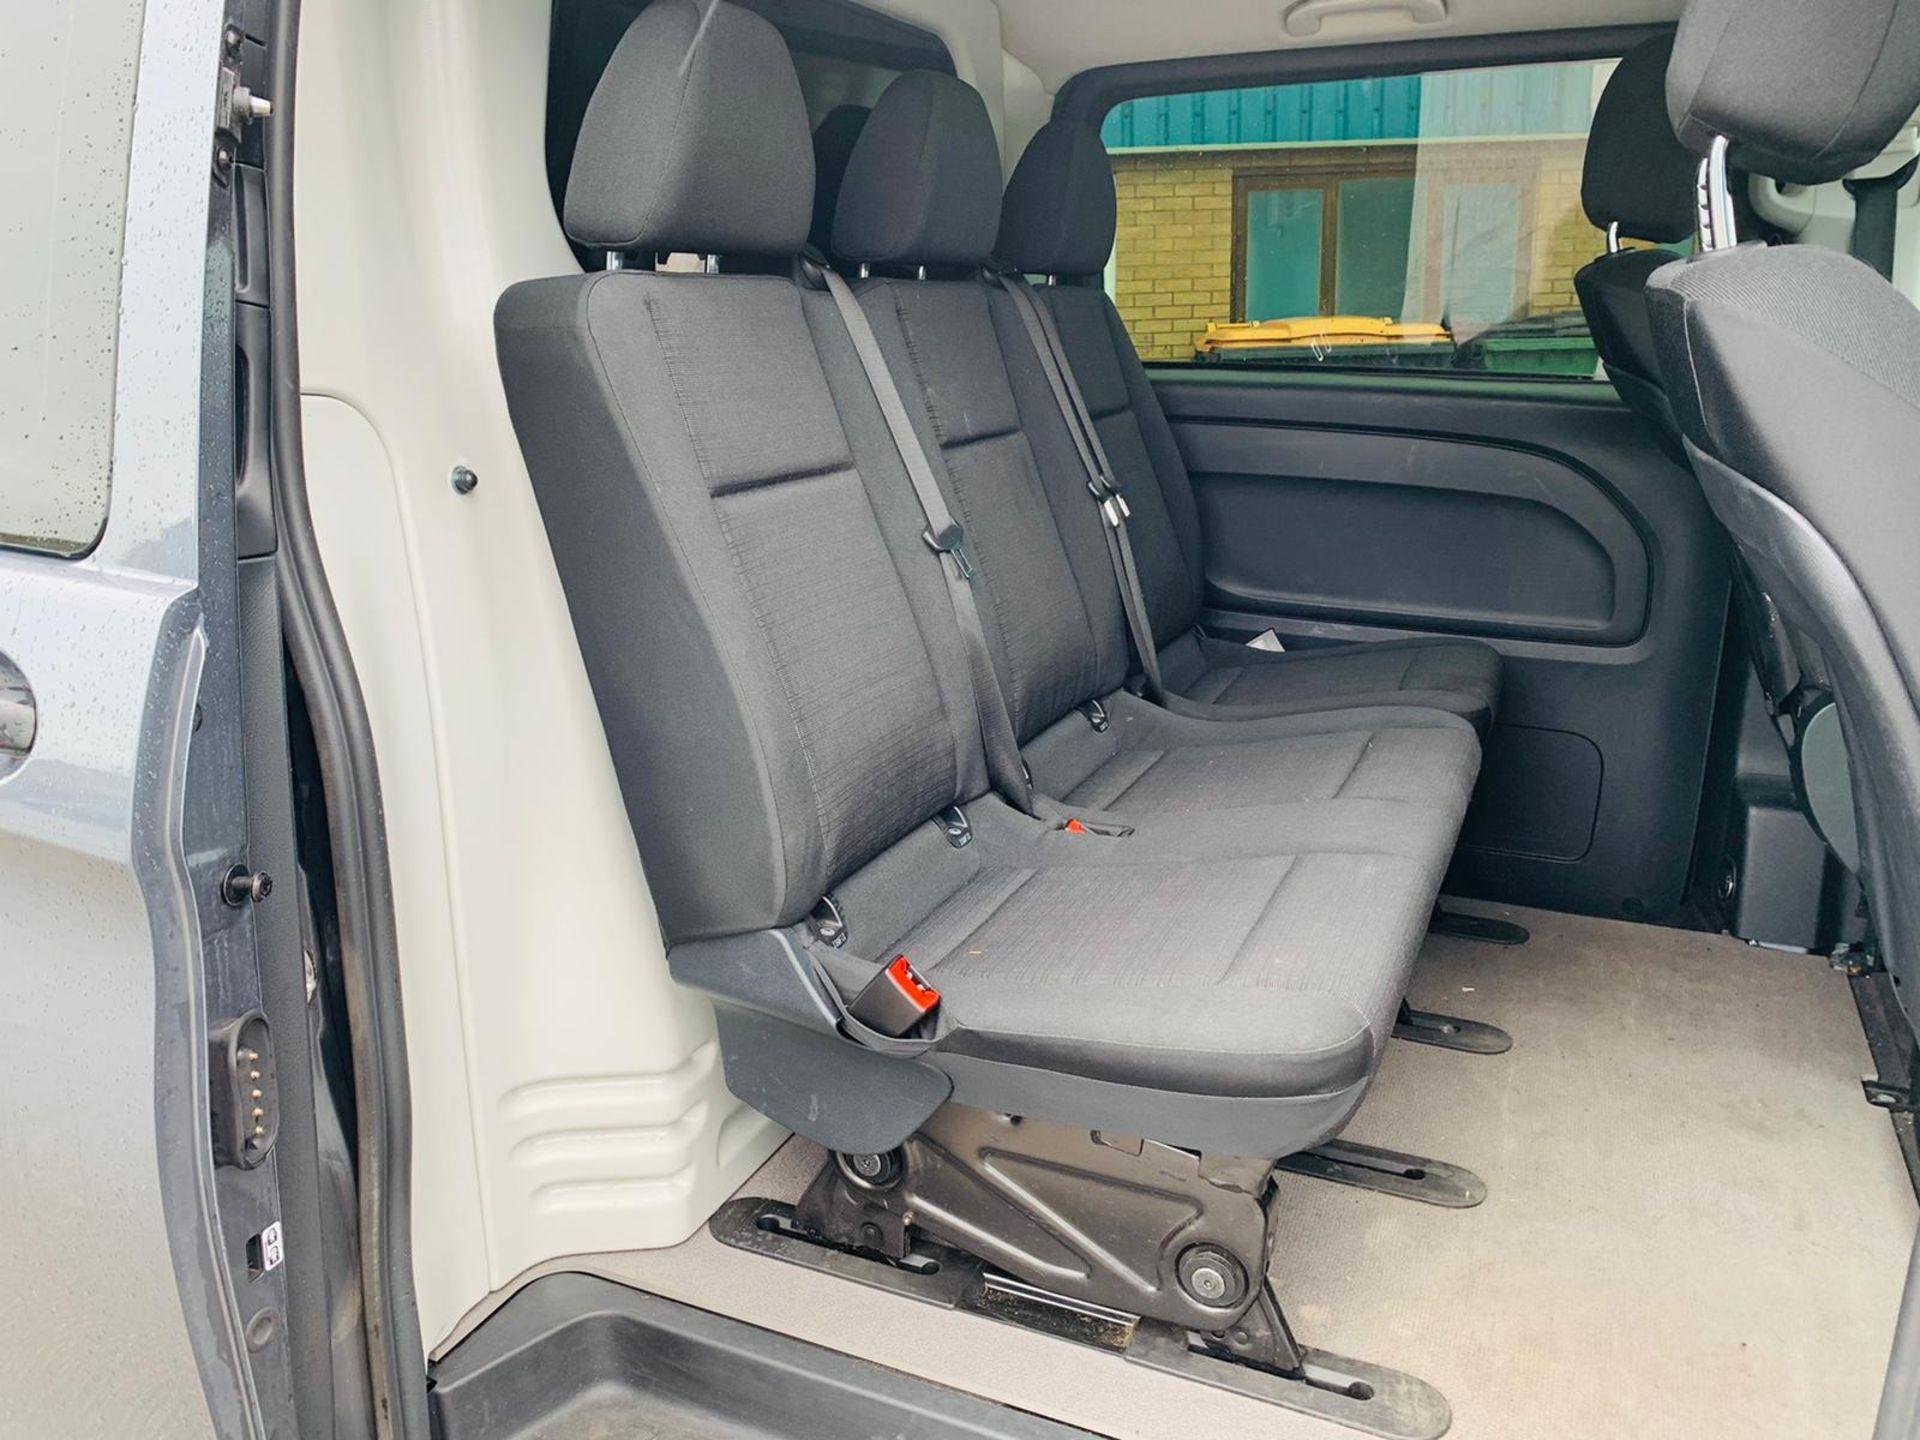 Mercedes Vito 114 Bluetec Dualiner/Crew Van - Auto - Air Con - 2018 18 Reg - 1 Owner From New - Image 25 of 25